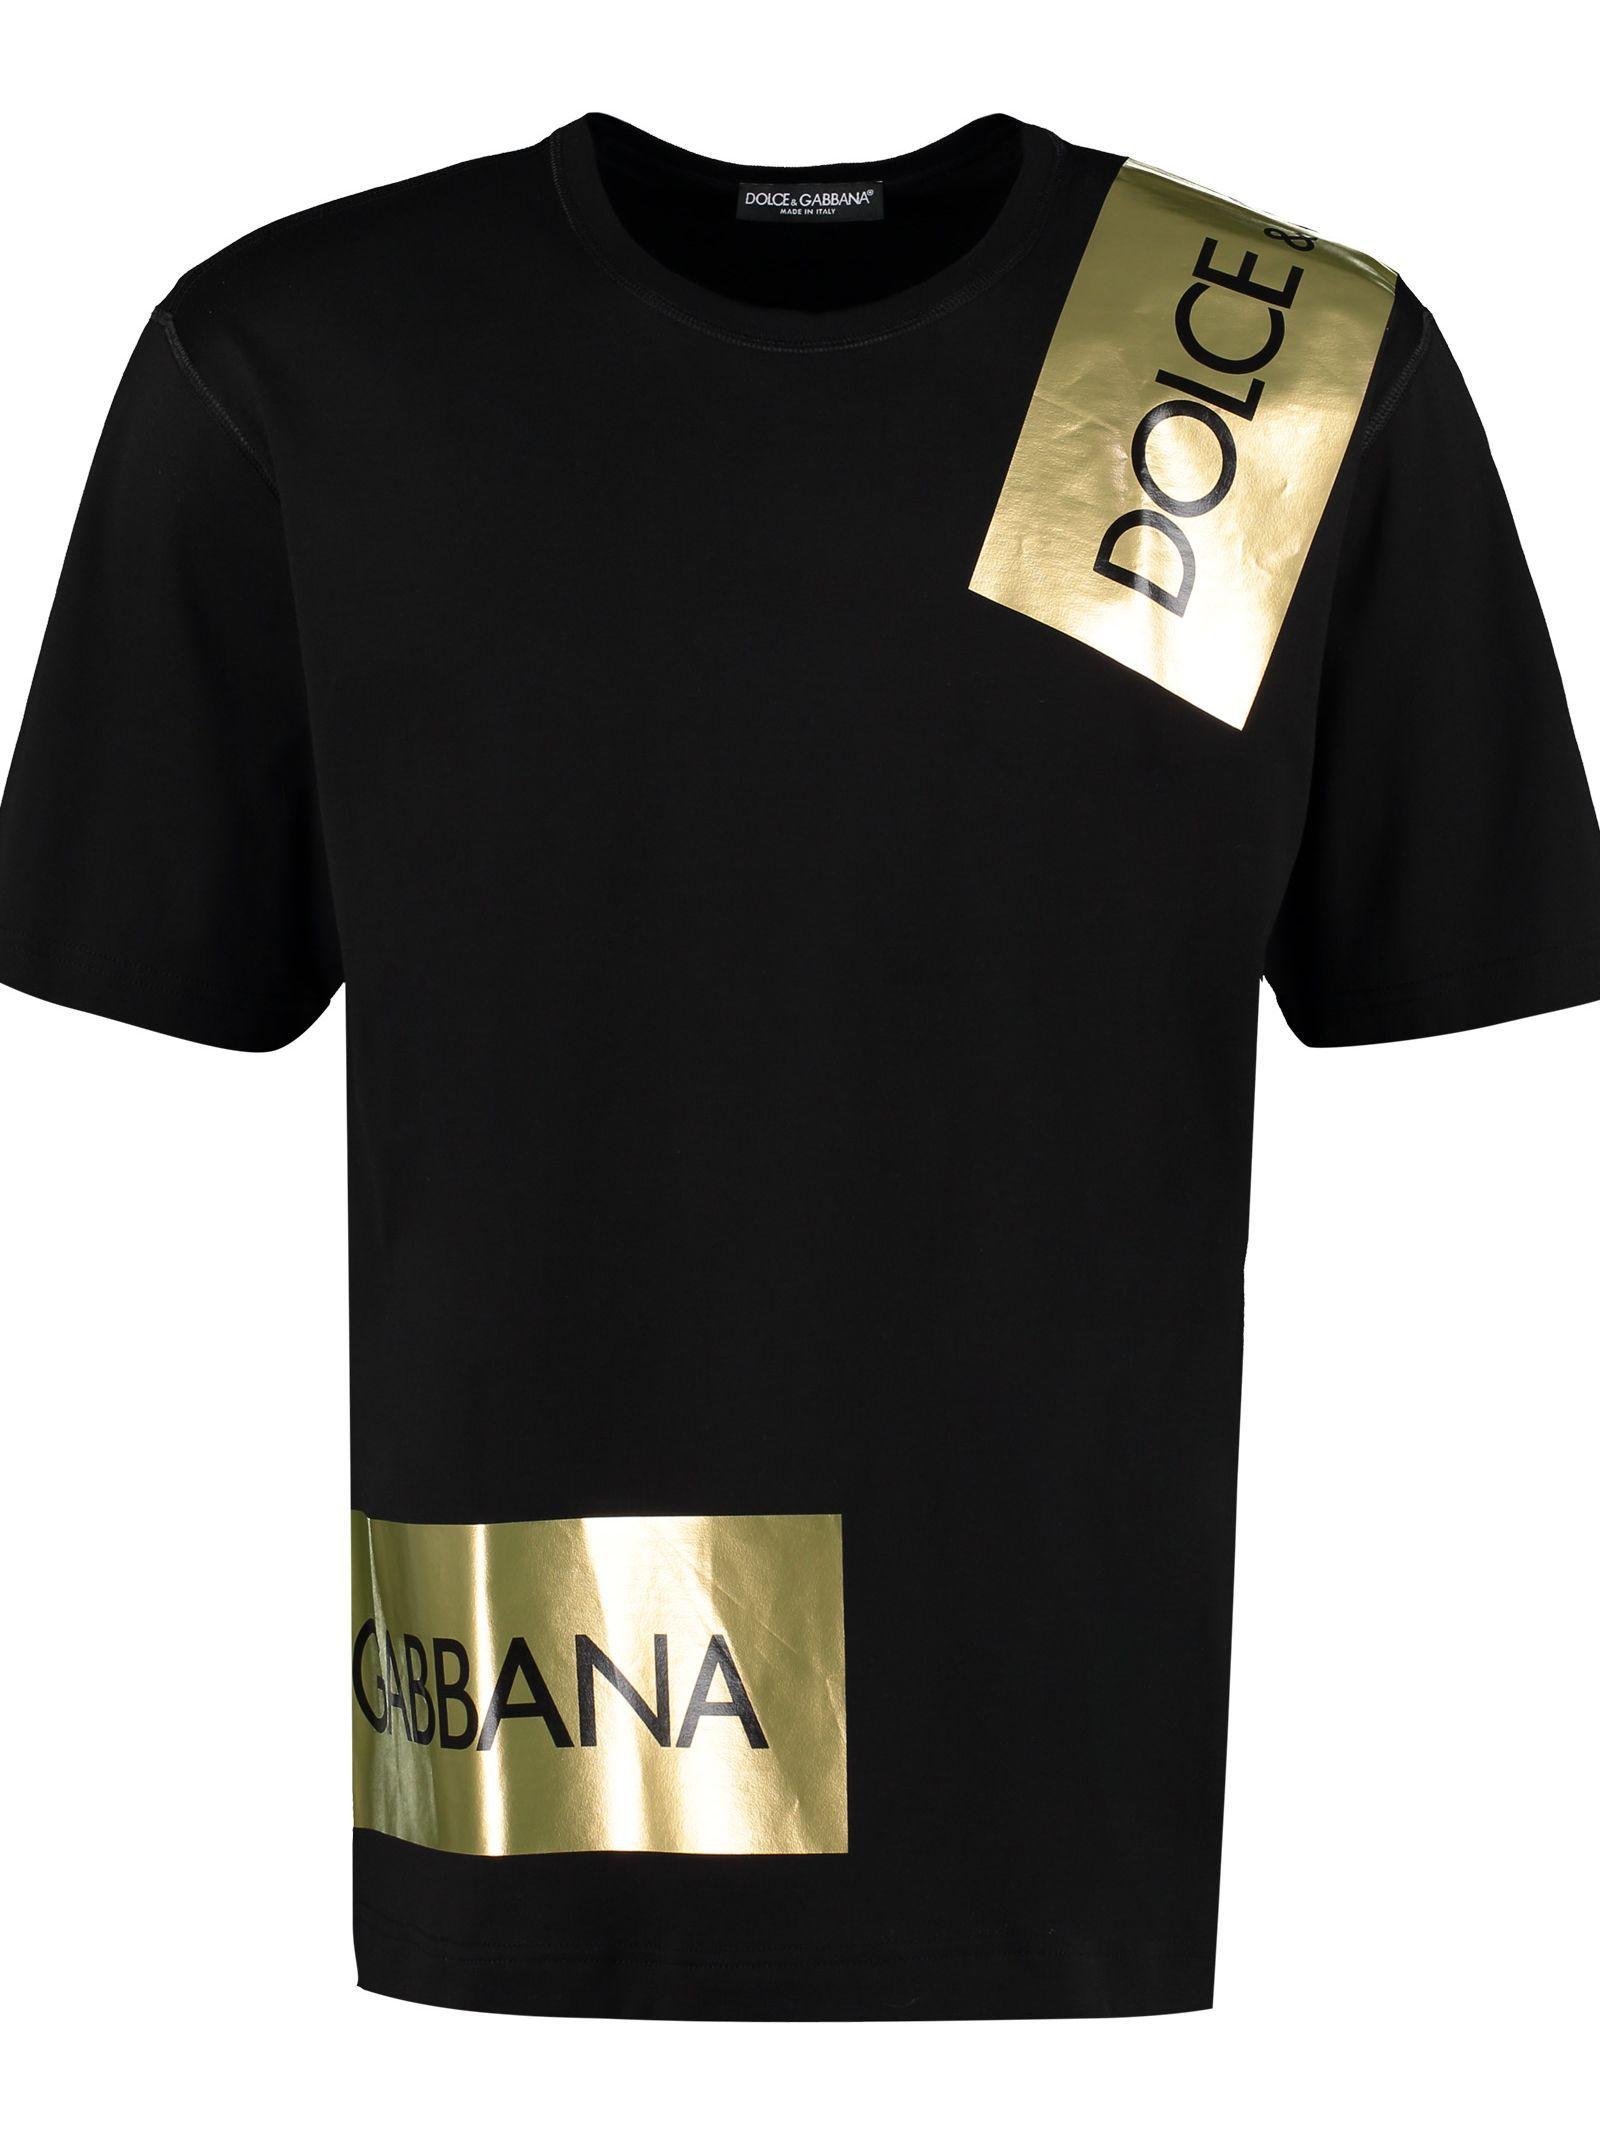 Dolce Gabbana Printed Cotton T Shirt Dolcegabbana Cloth Cotton Tshirt Dolce And Gabbana Printed Cotton